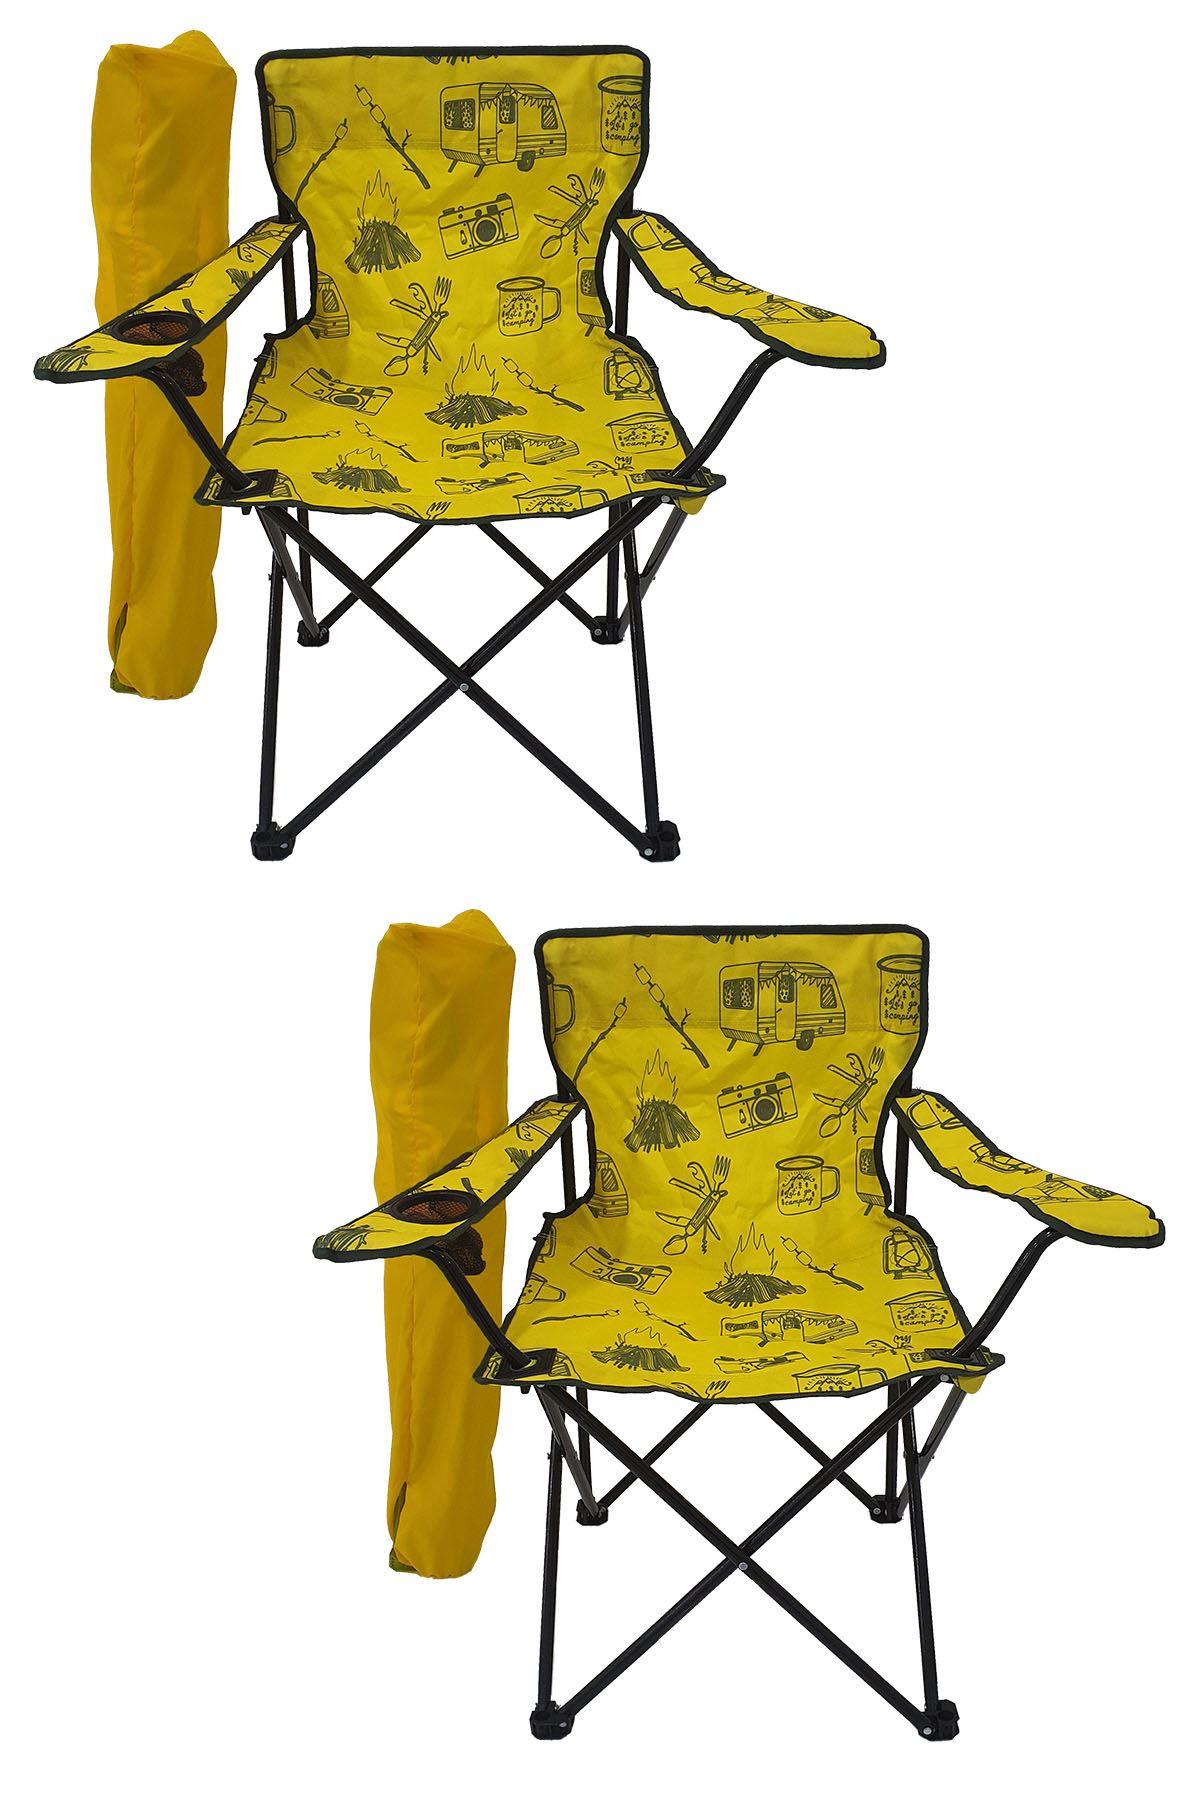 Bofigo 2 Pieces Camping Chair Folding Chair Garden Chair Picnic Beach Chair Patterned Yellow